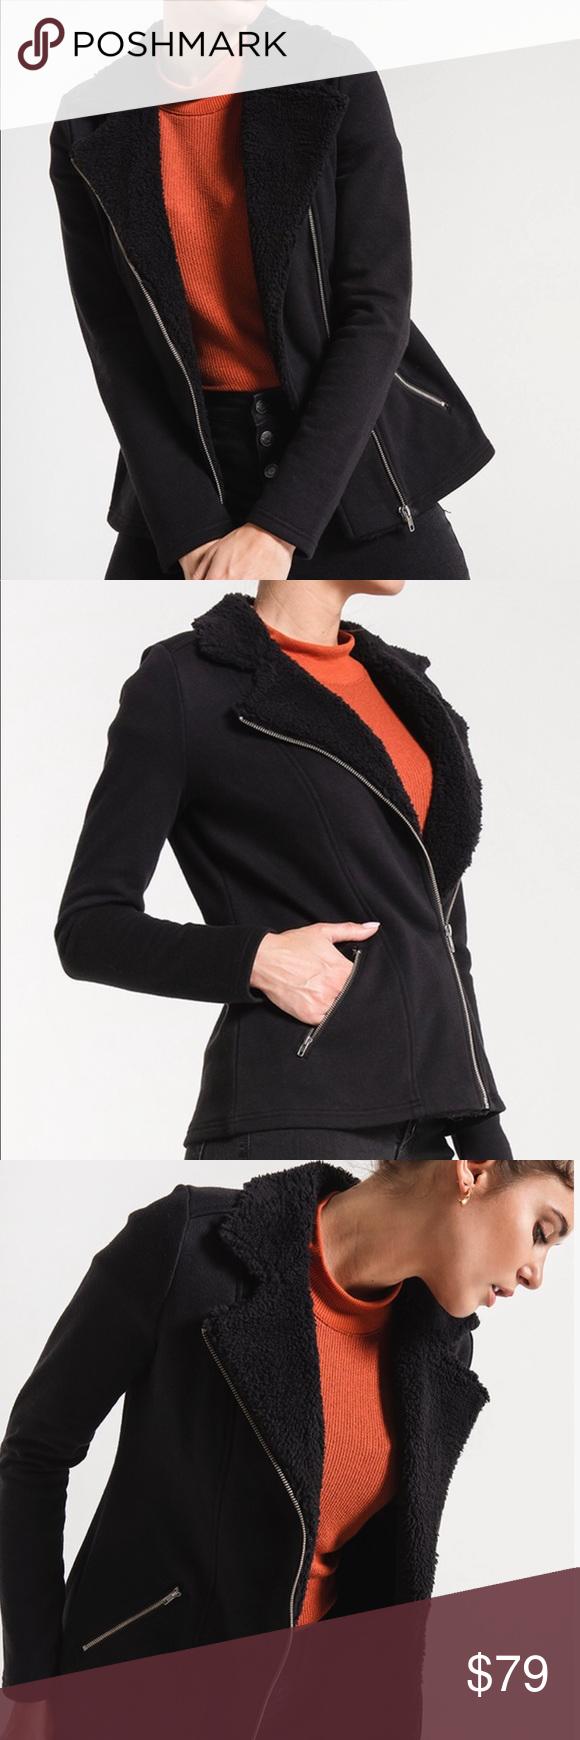 Sherpa Moto Jacket Jackets, Moto jacket, Clothes design